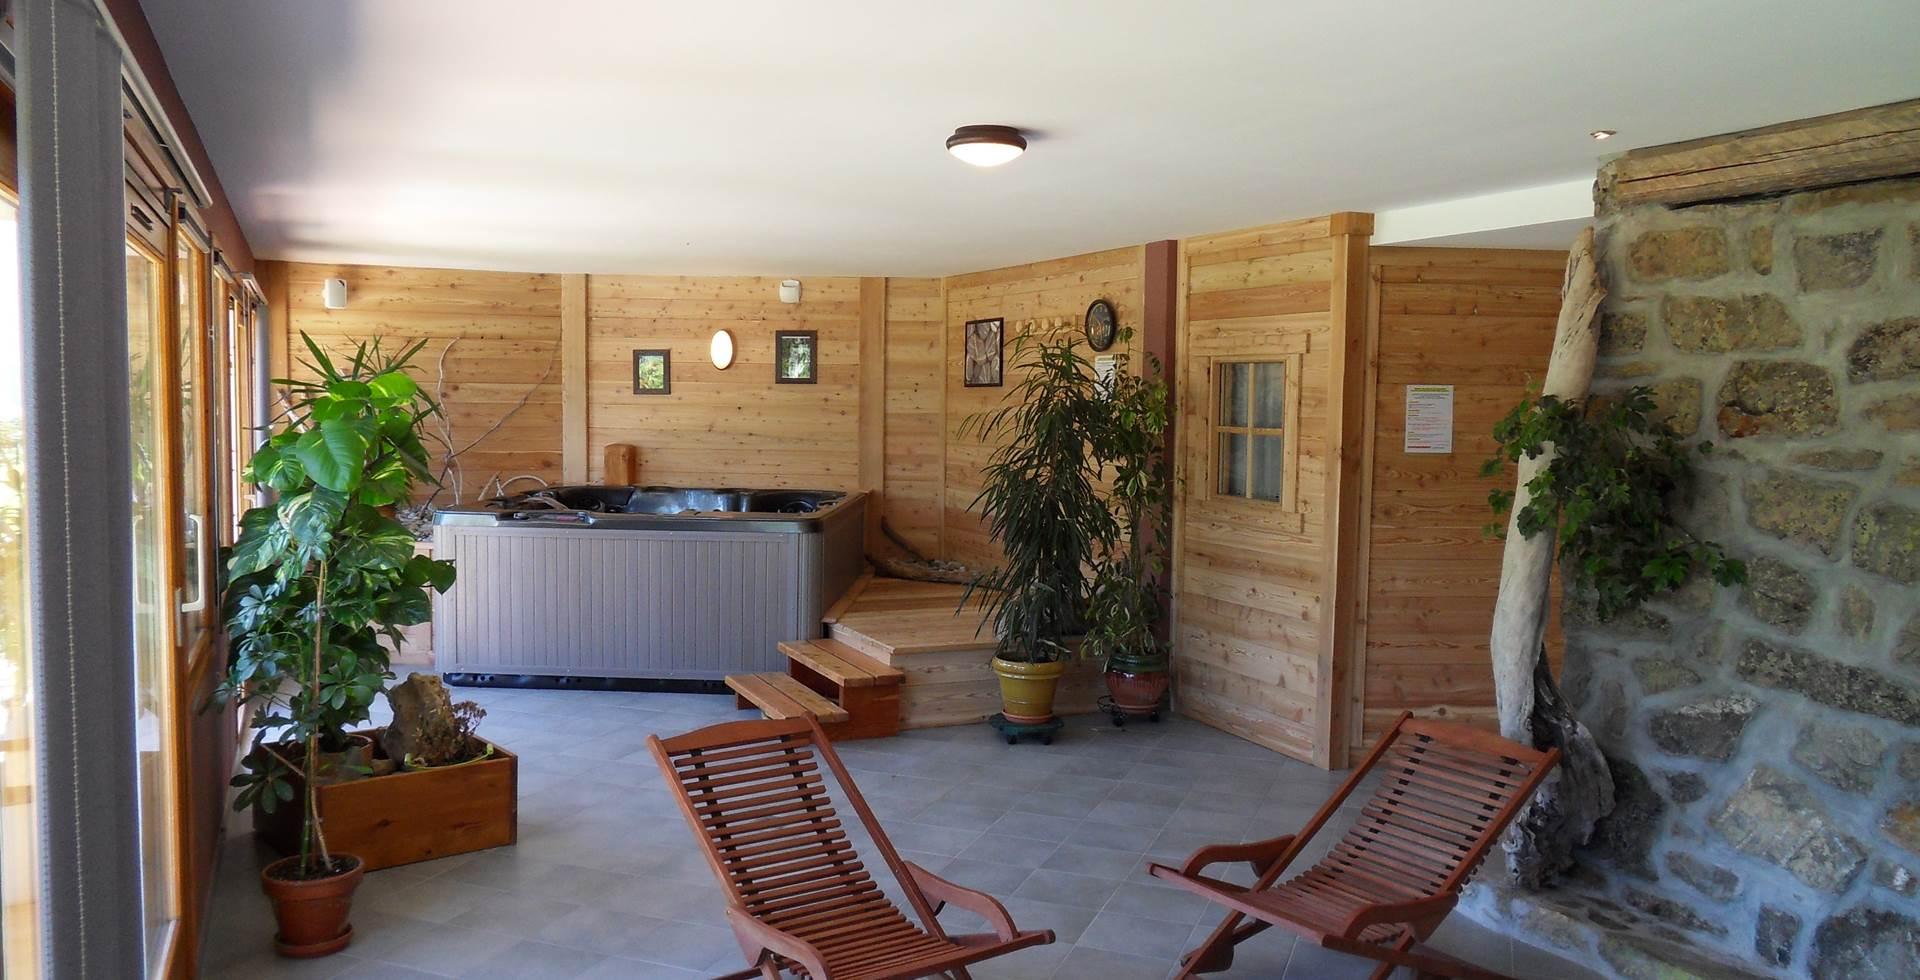 Espace détente saunajacuzzi